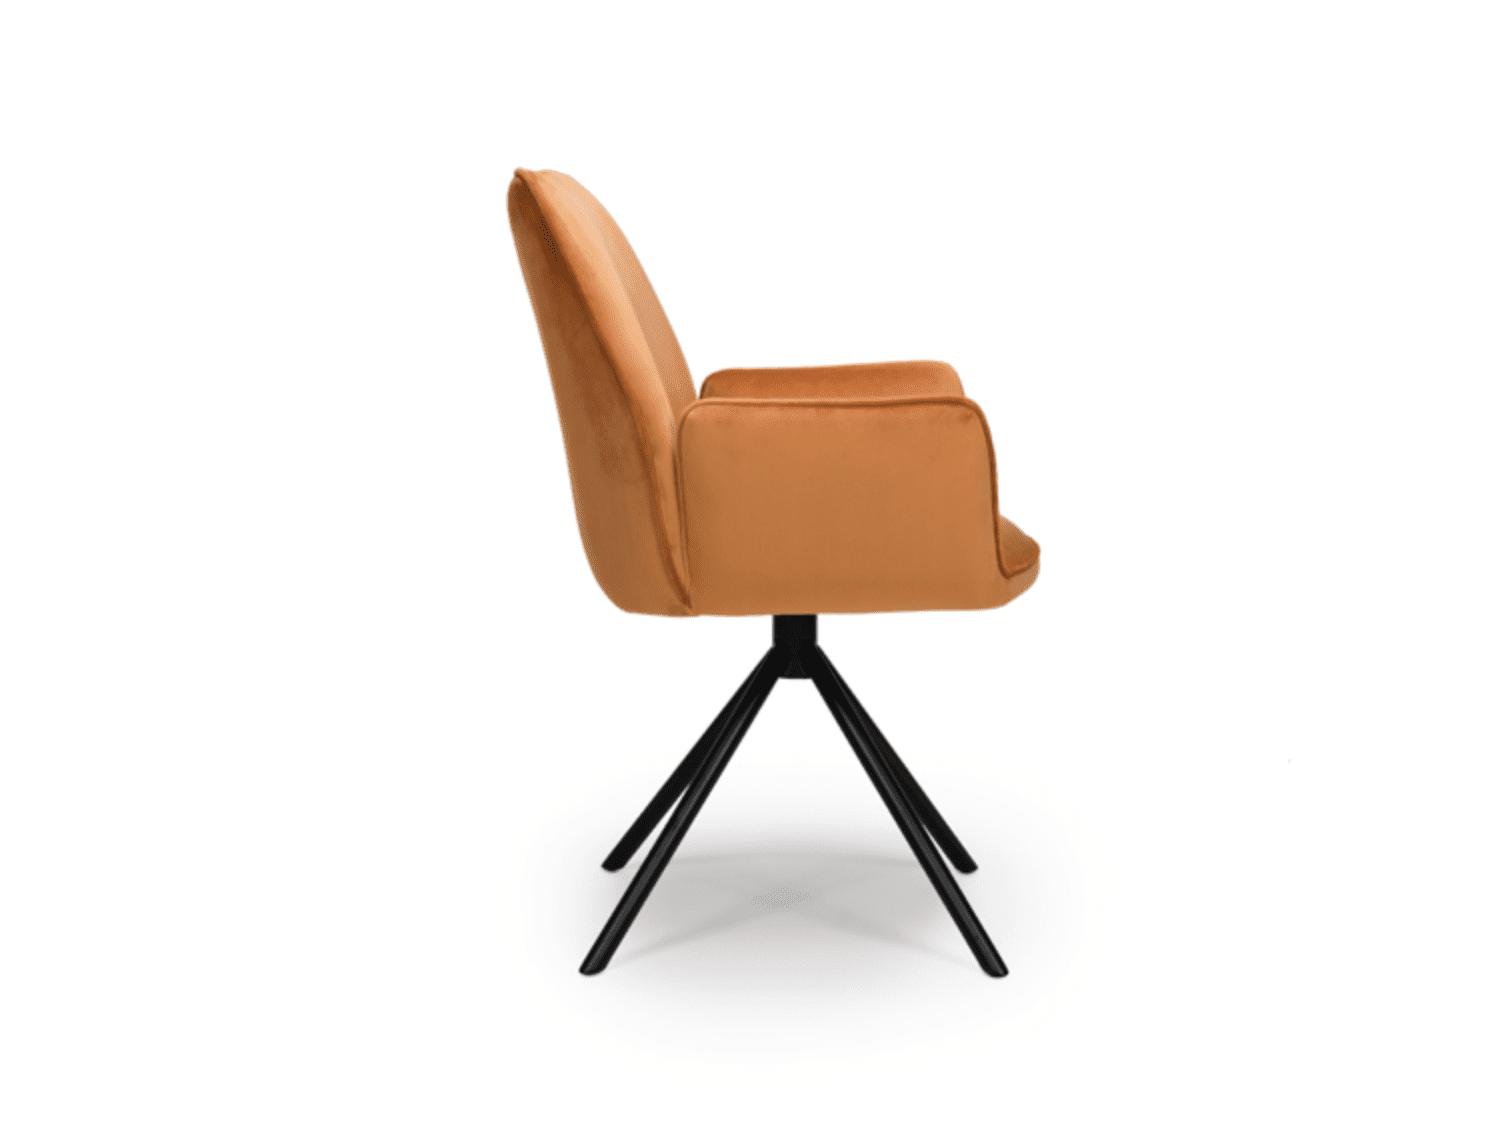 UNO chair burnt orange side